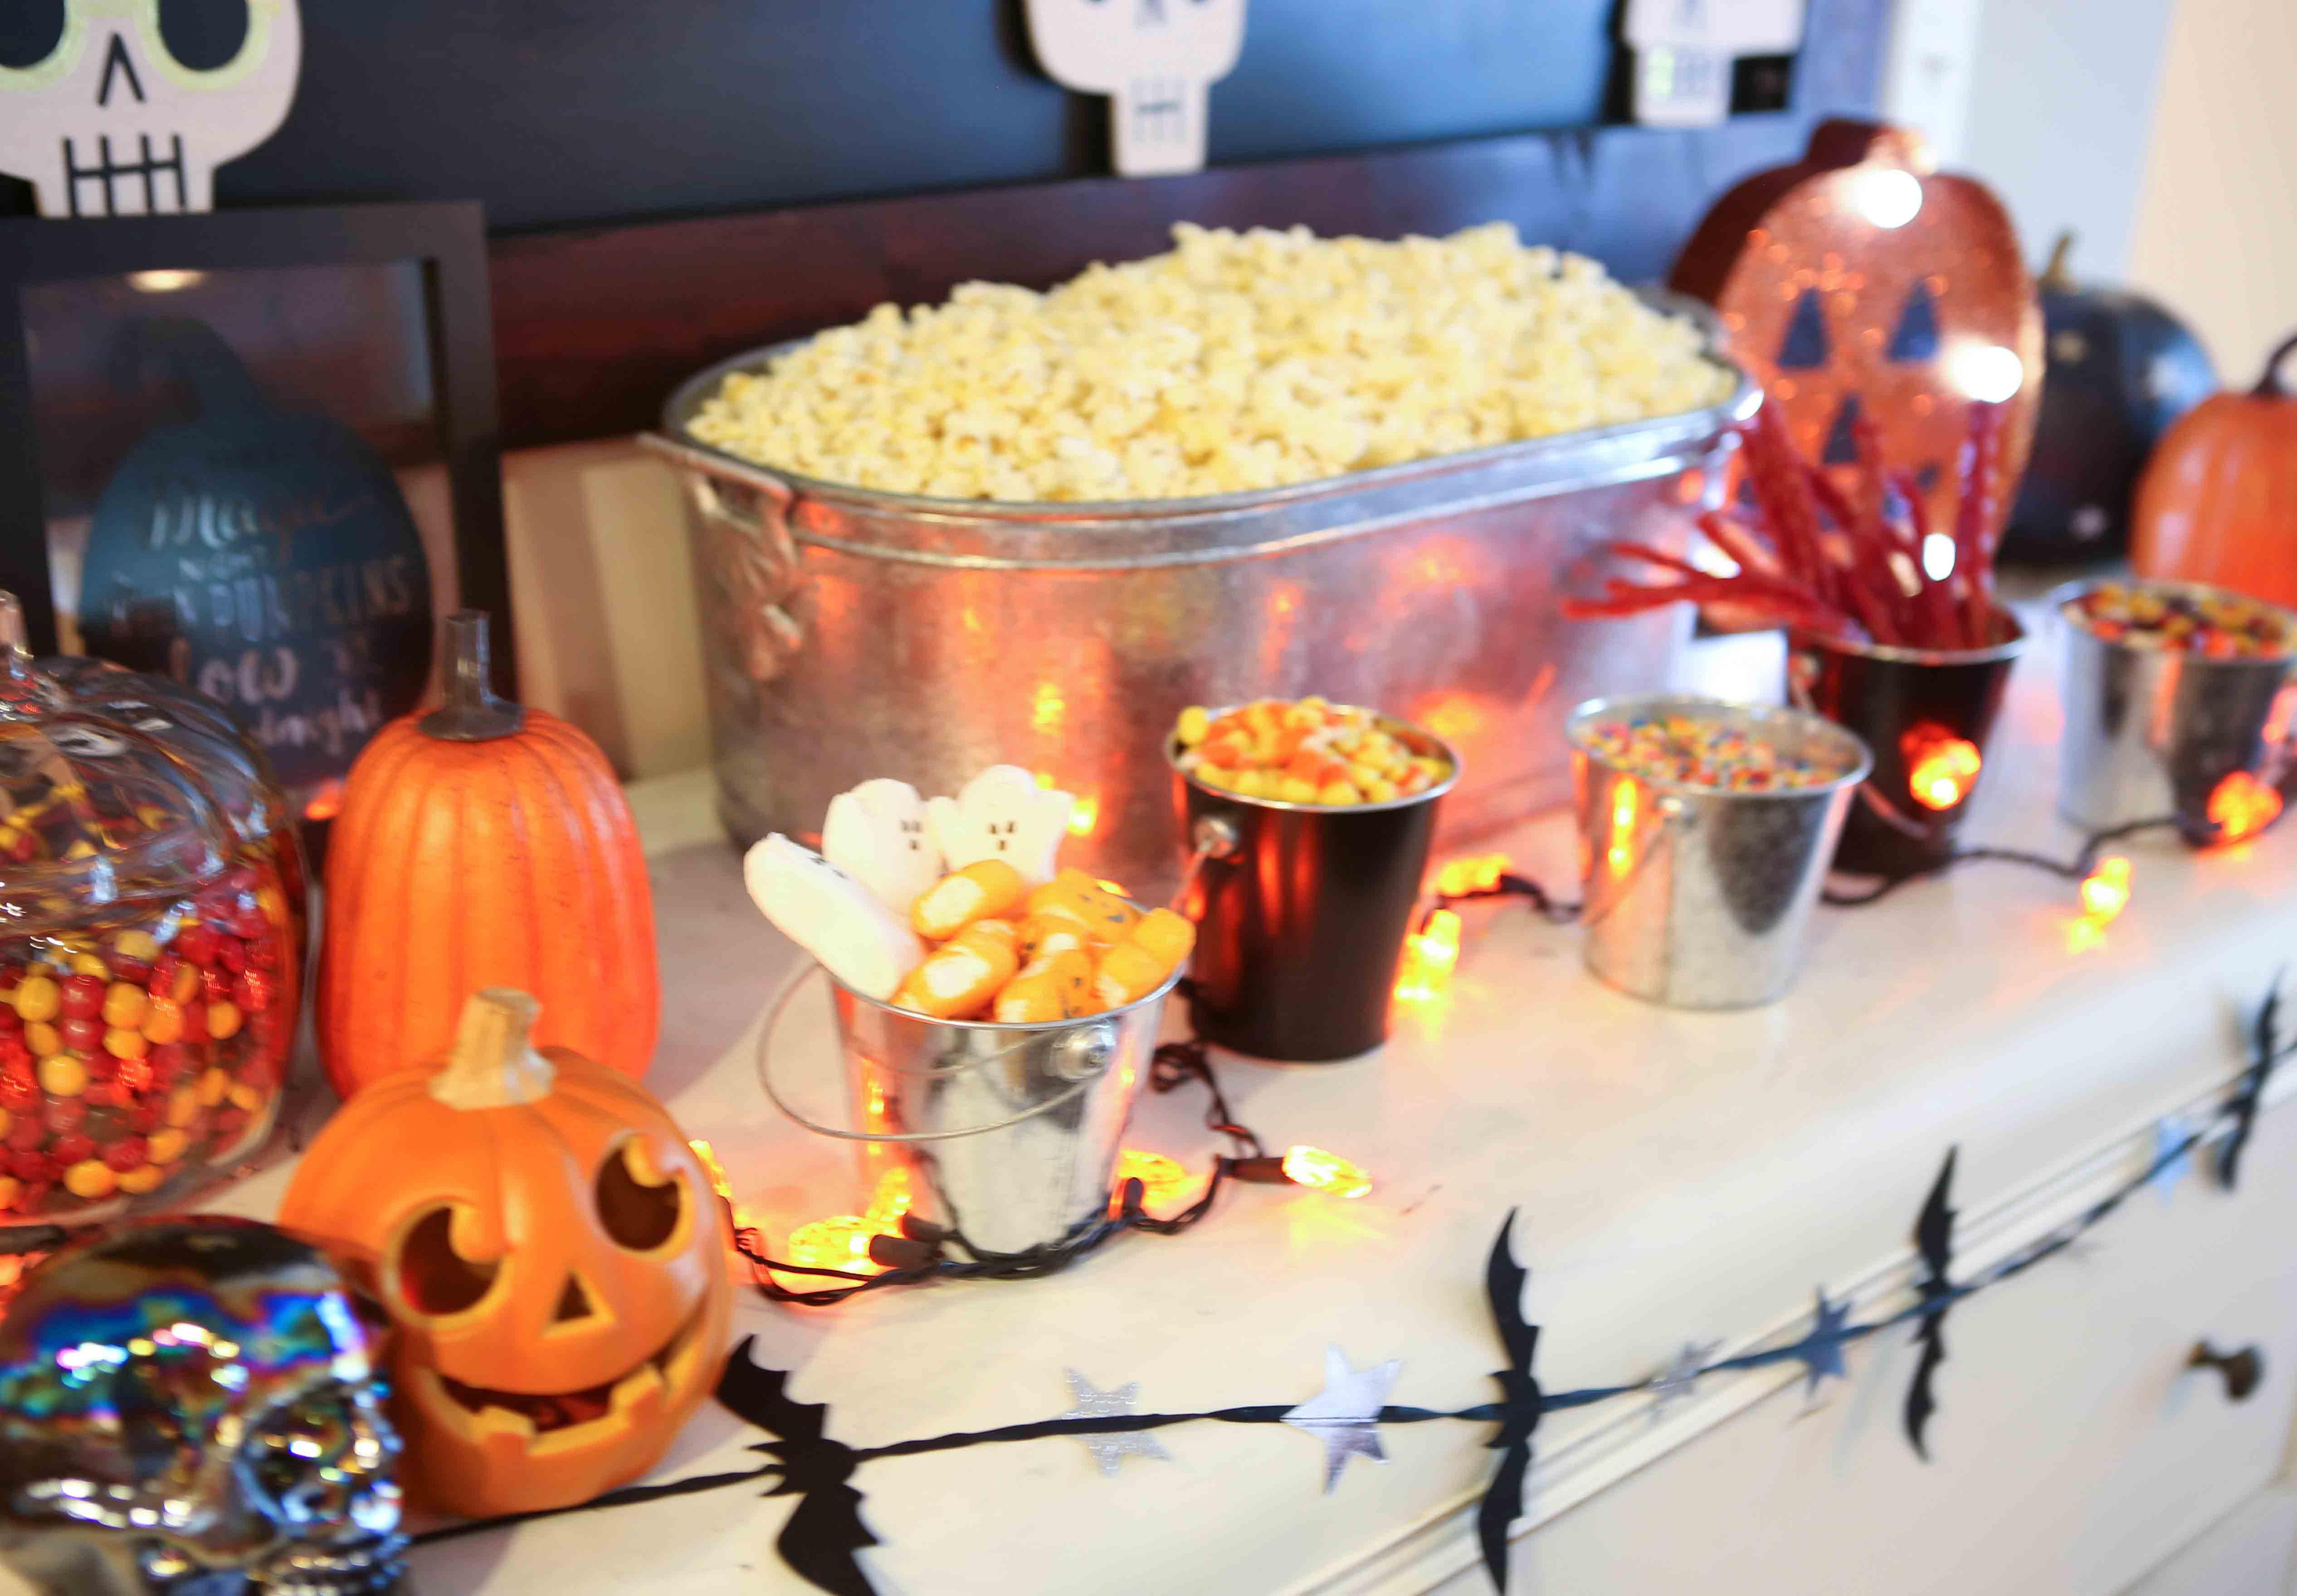 Halloween Popcorn Bar by Atlanta lifestyle blogger Happily Hughes